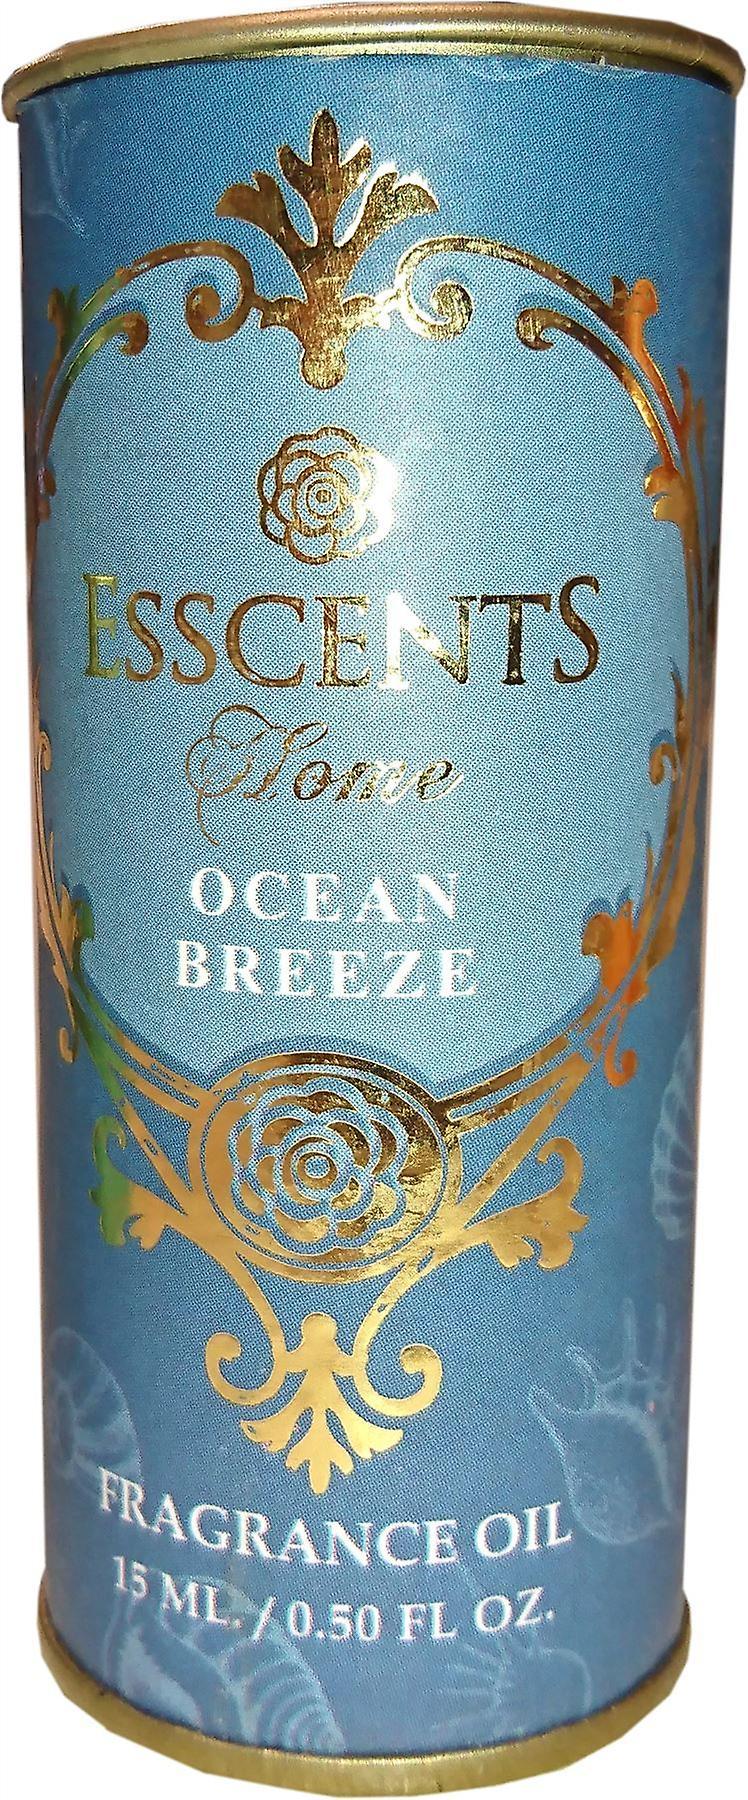 Esscents Home Fragrance Oil Ocean Breeze15ml Tinned